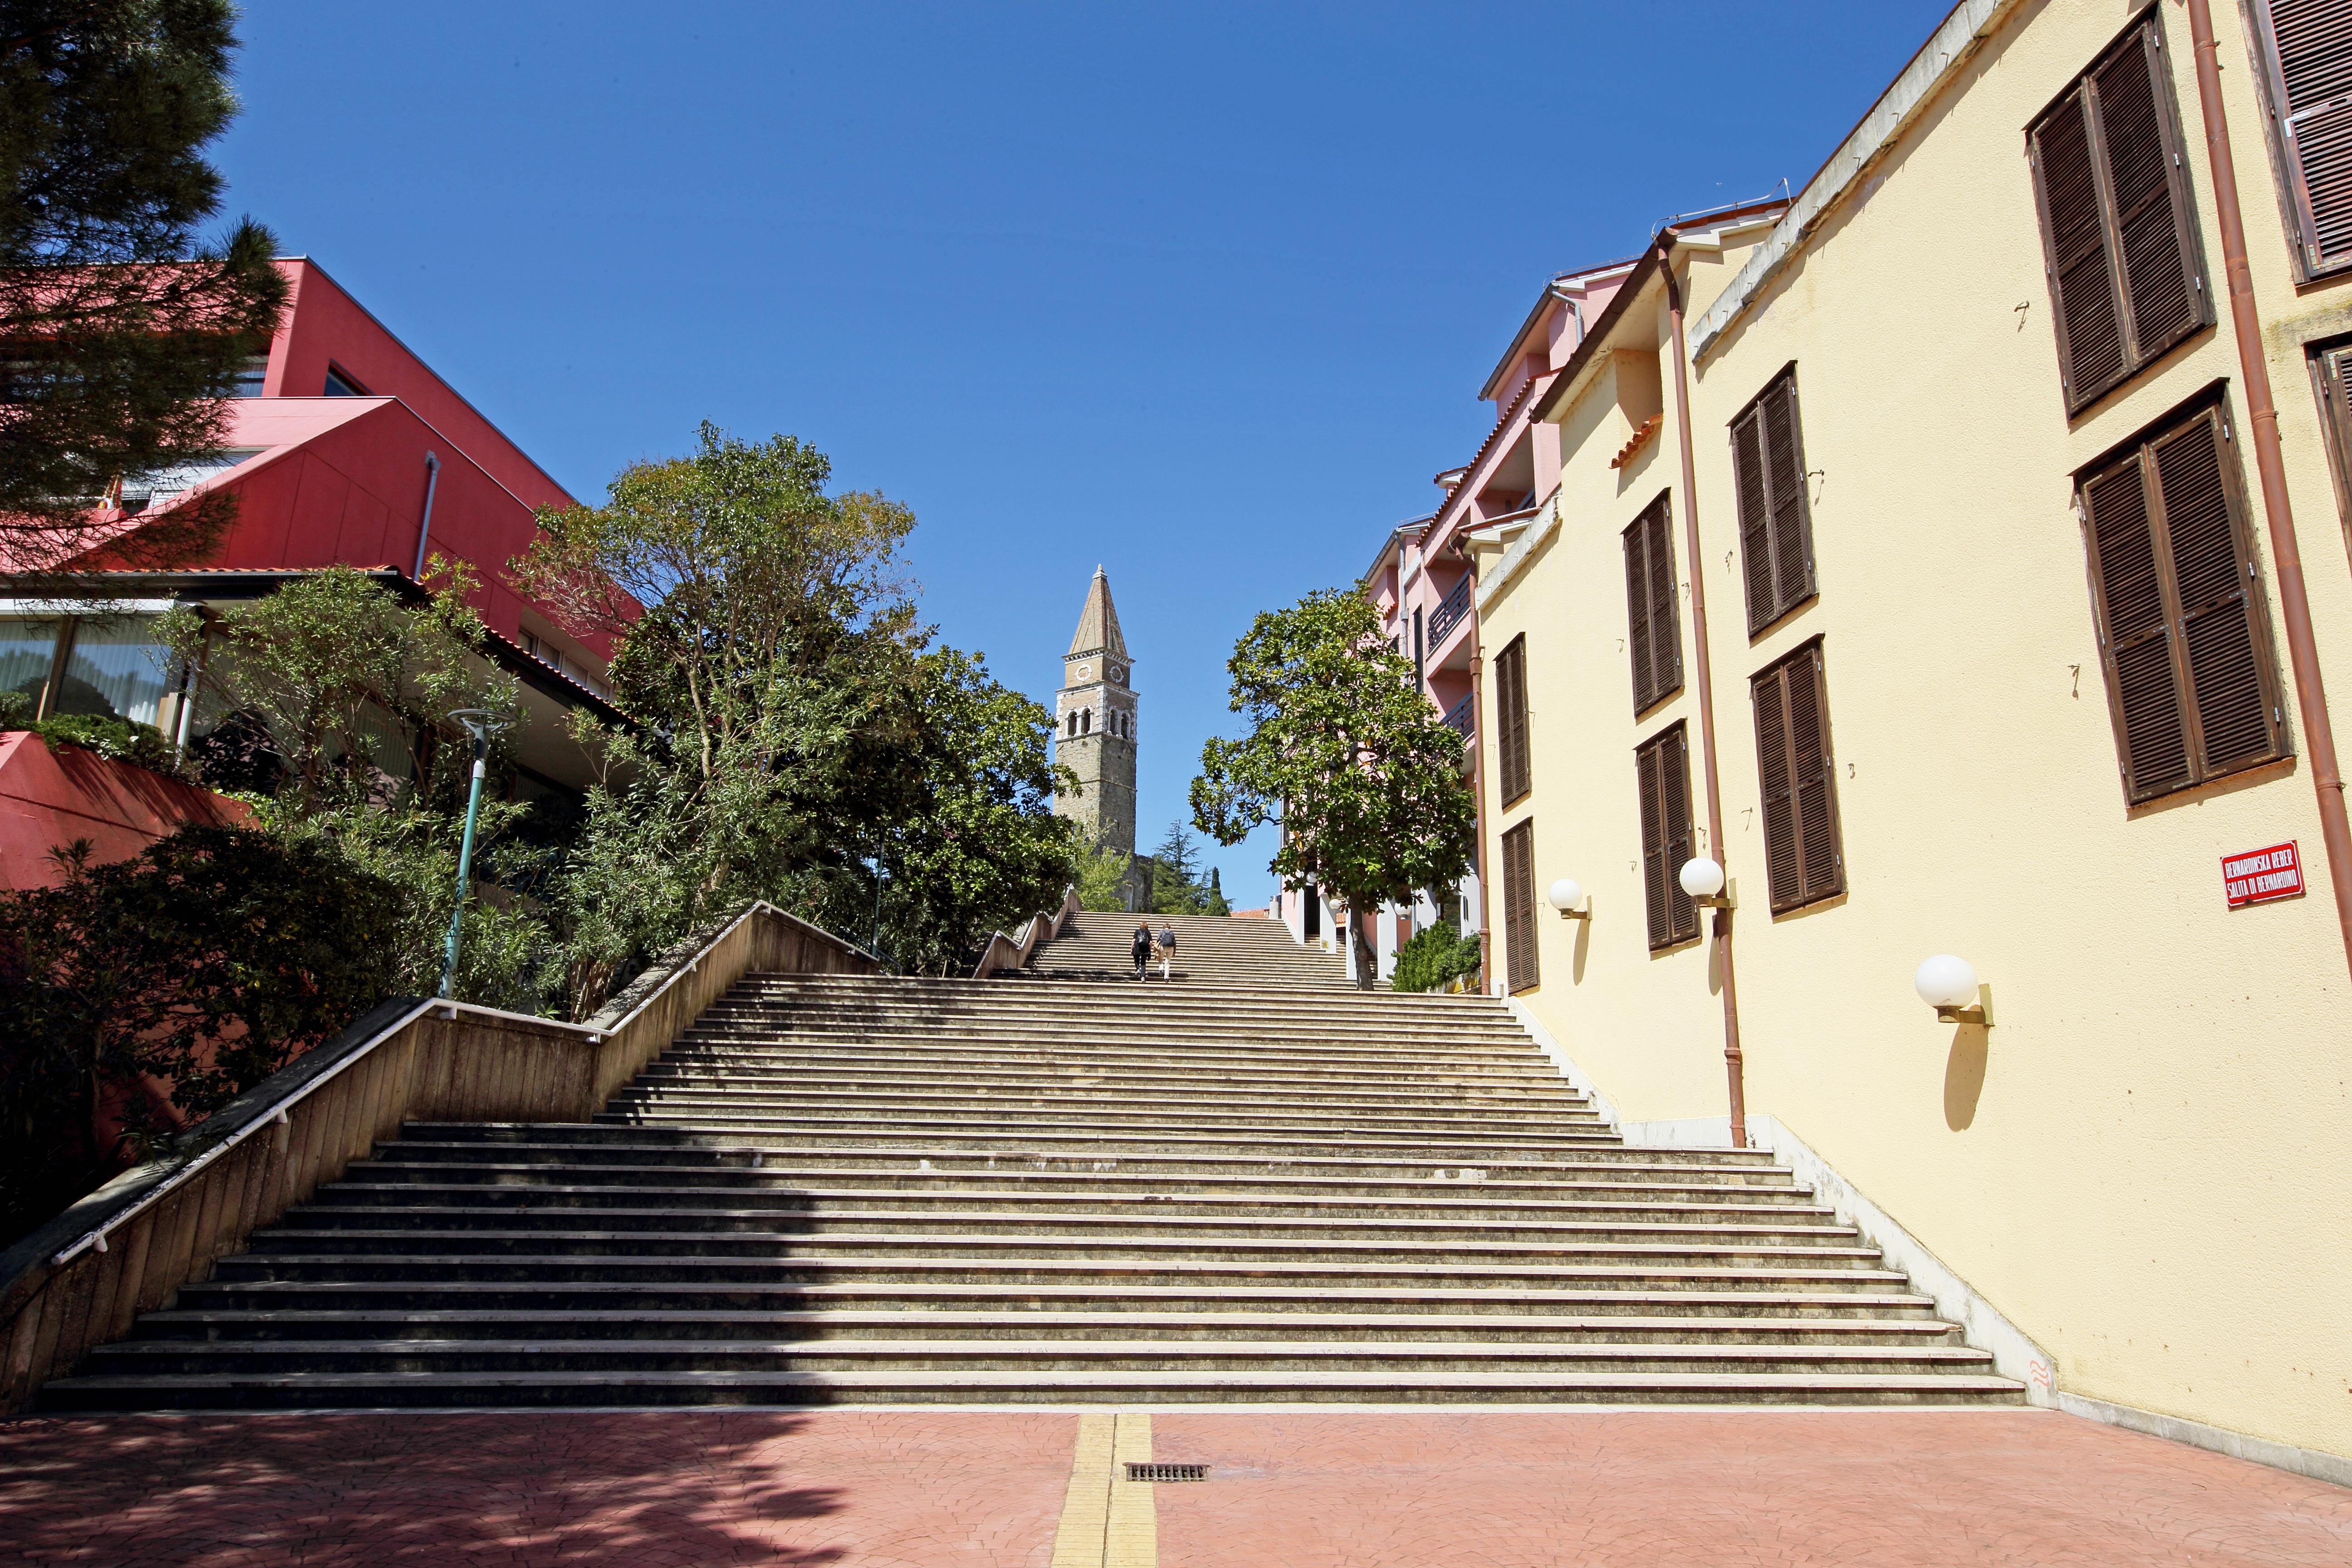 http://www.travelsys.sk/public/users/paxtour/images/fotogaleria_hotel/l_stairway_bernardin.jpg.jpg